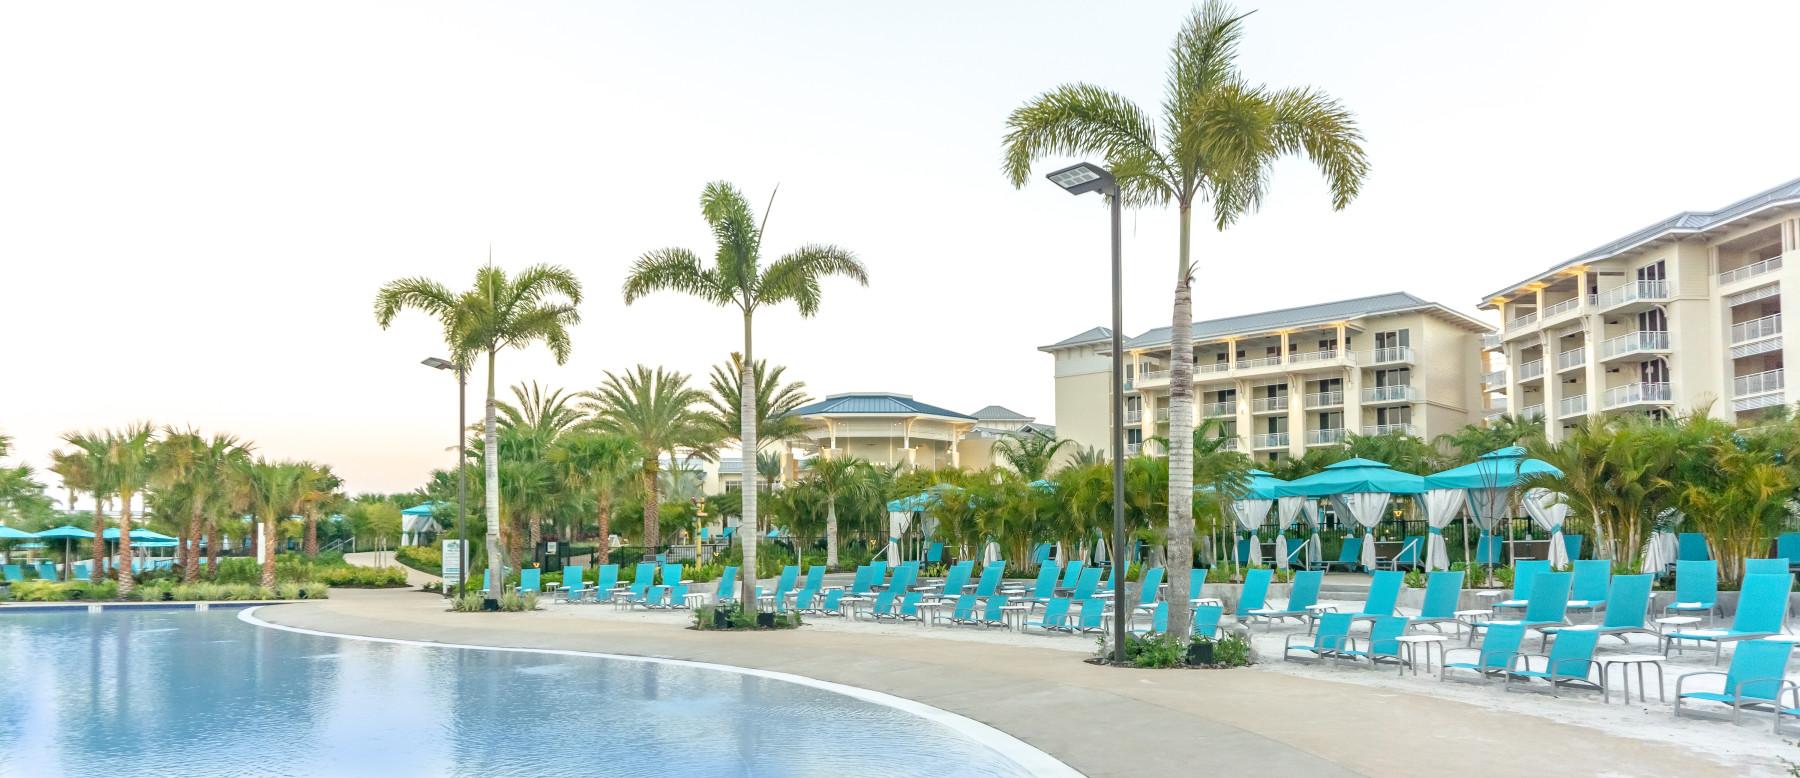 Margaritaville Resort Orlando Experience Kissimmee